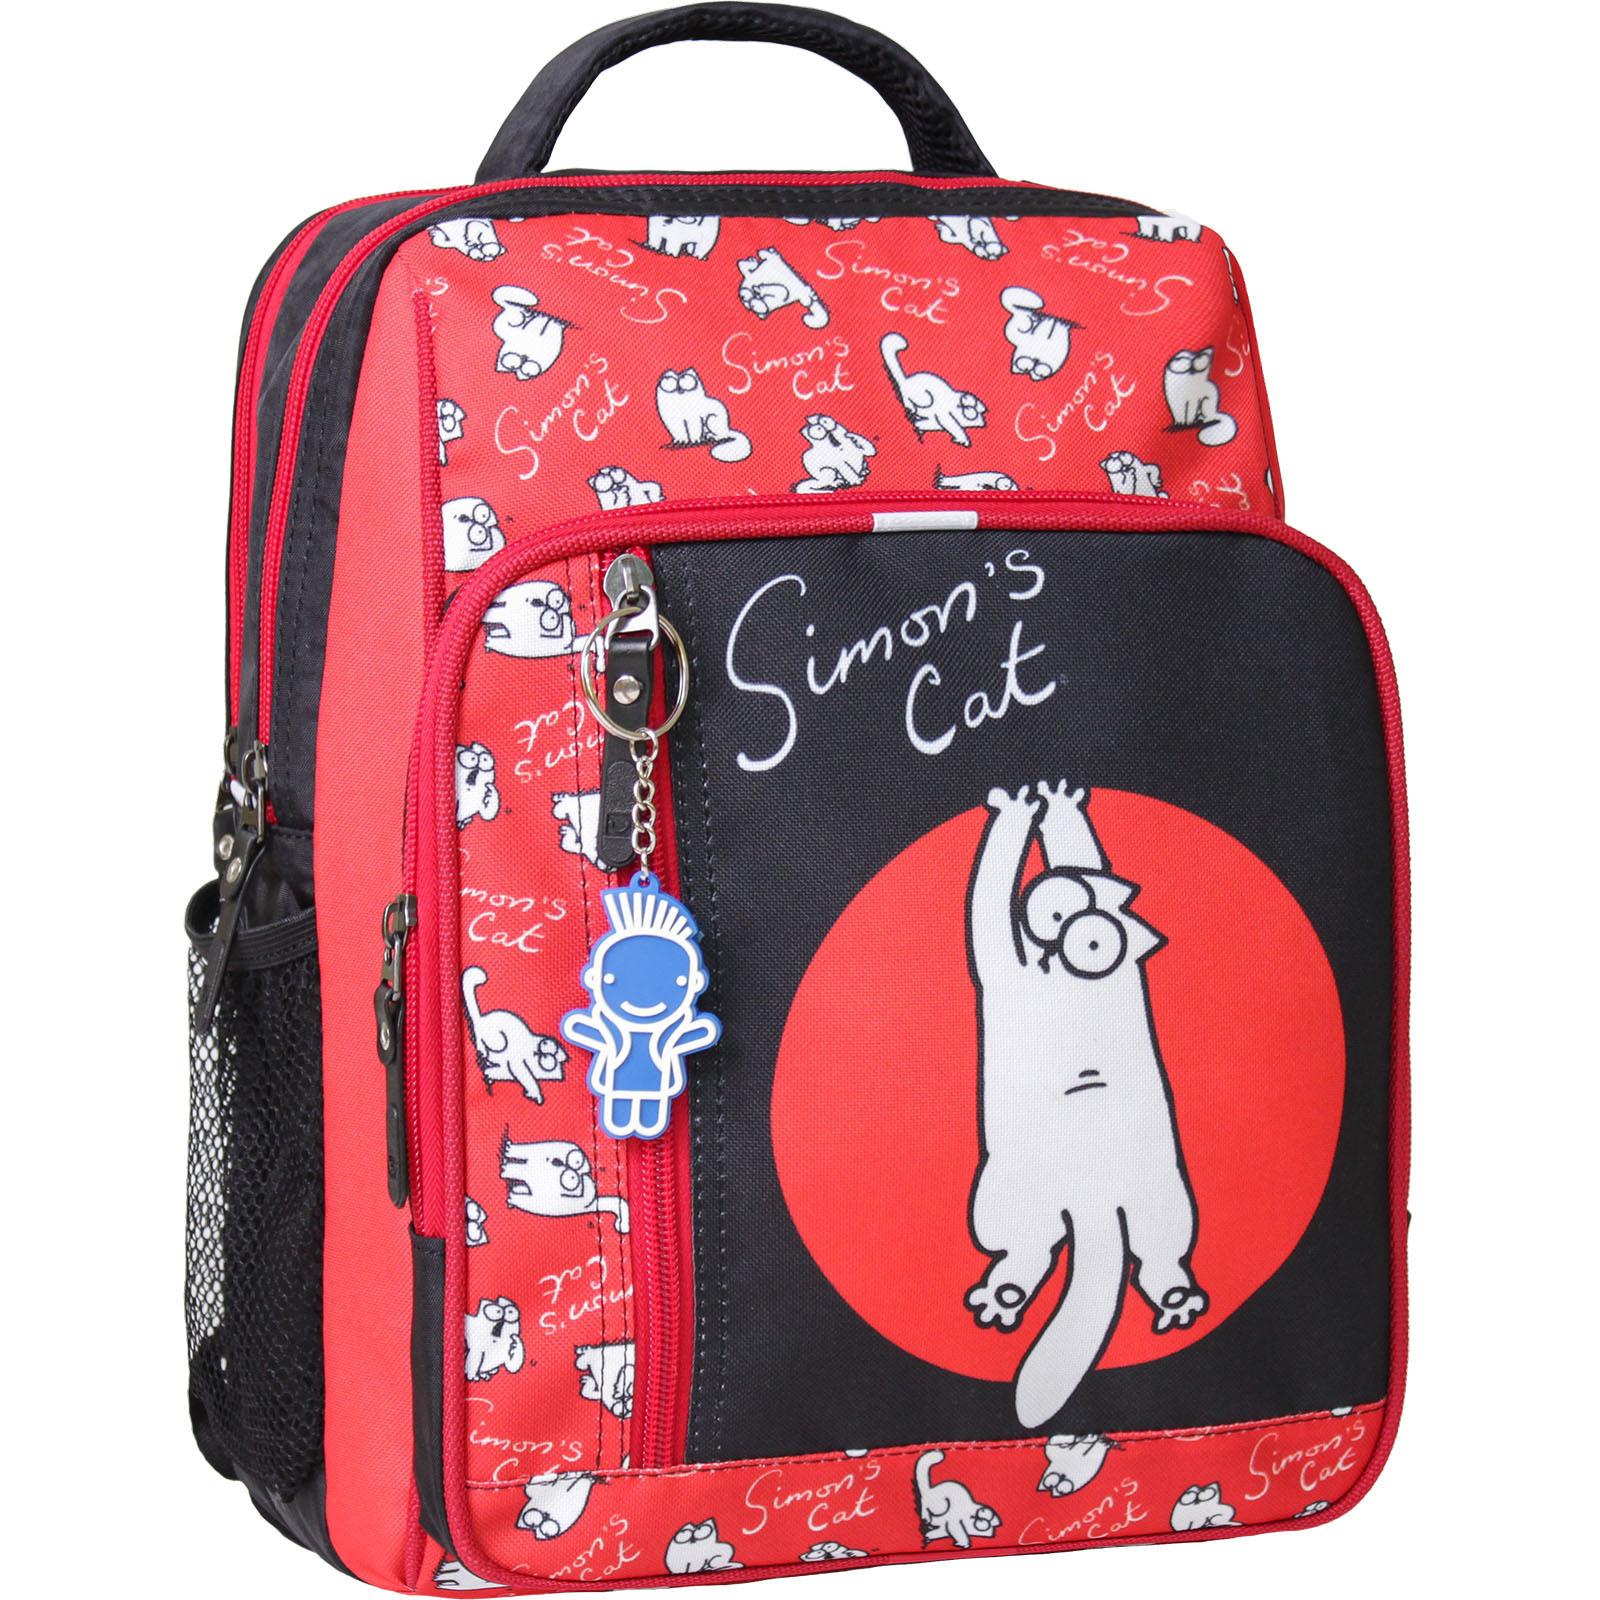 Школьные рюкзаки Рюкзак школьный Bagland Школьник 8 л. Черный 1к (0012870) IMG_5814-1600_1к.jpg